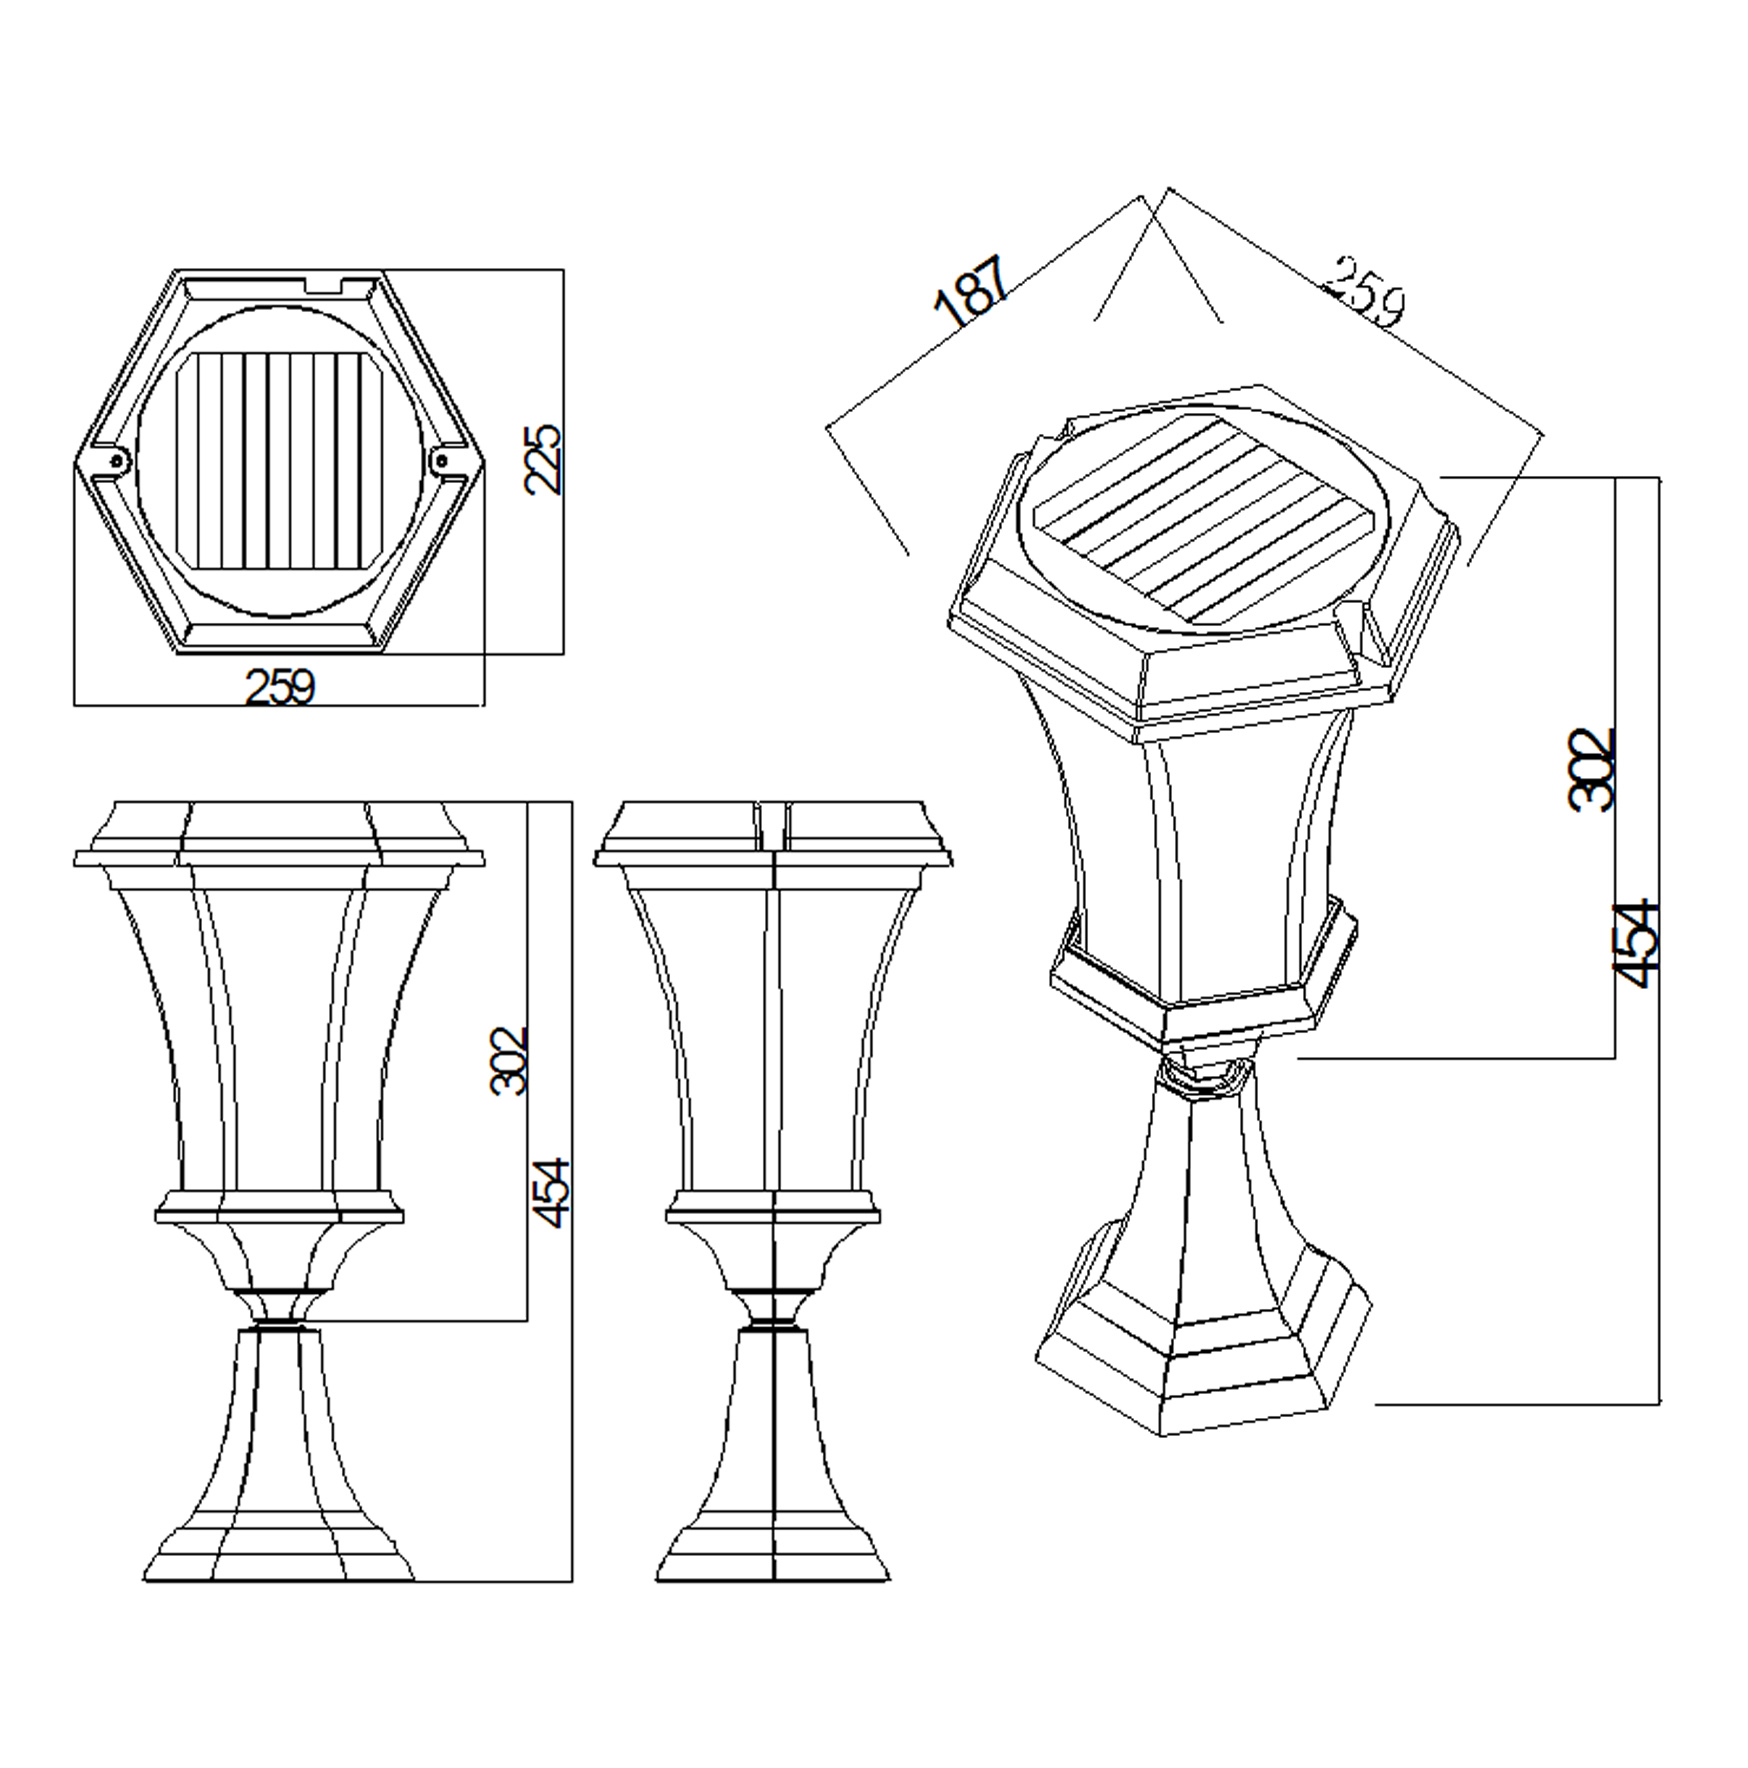 solamon-pedestal-line-drawing